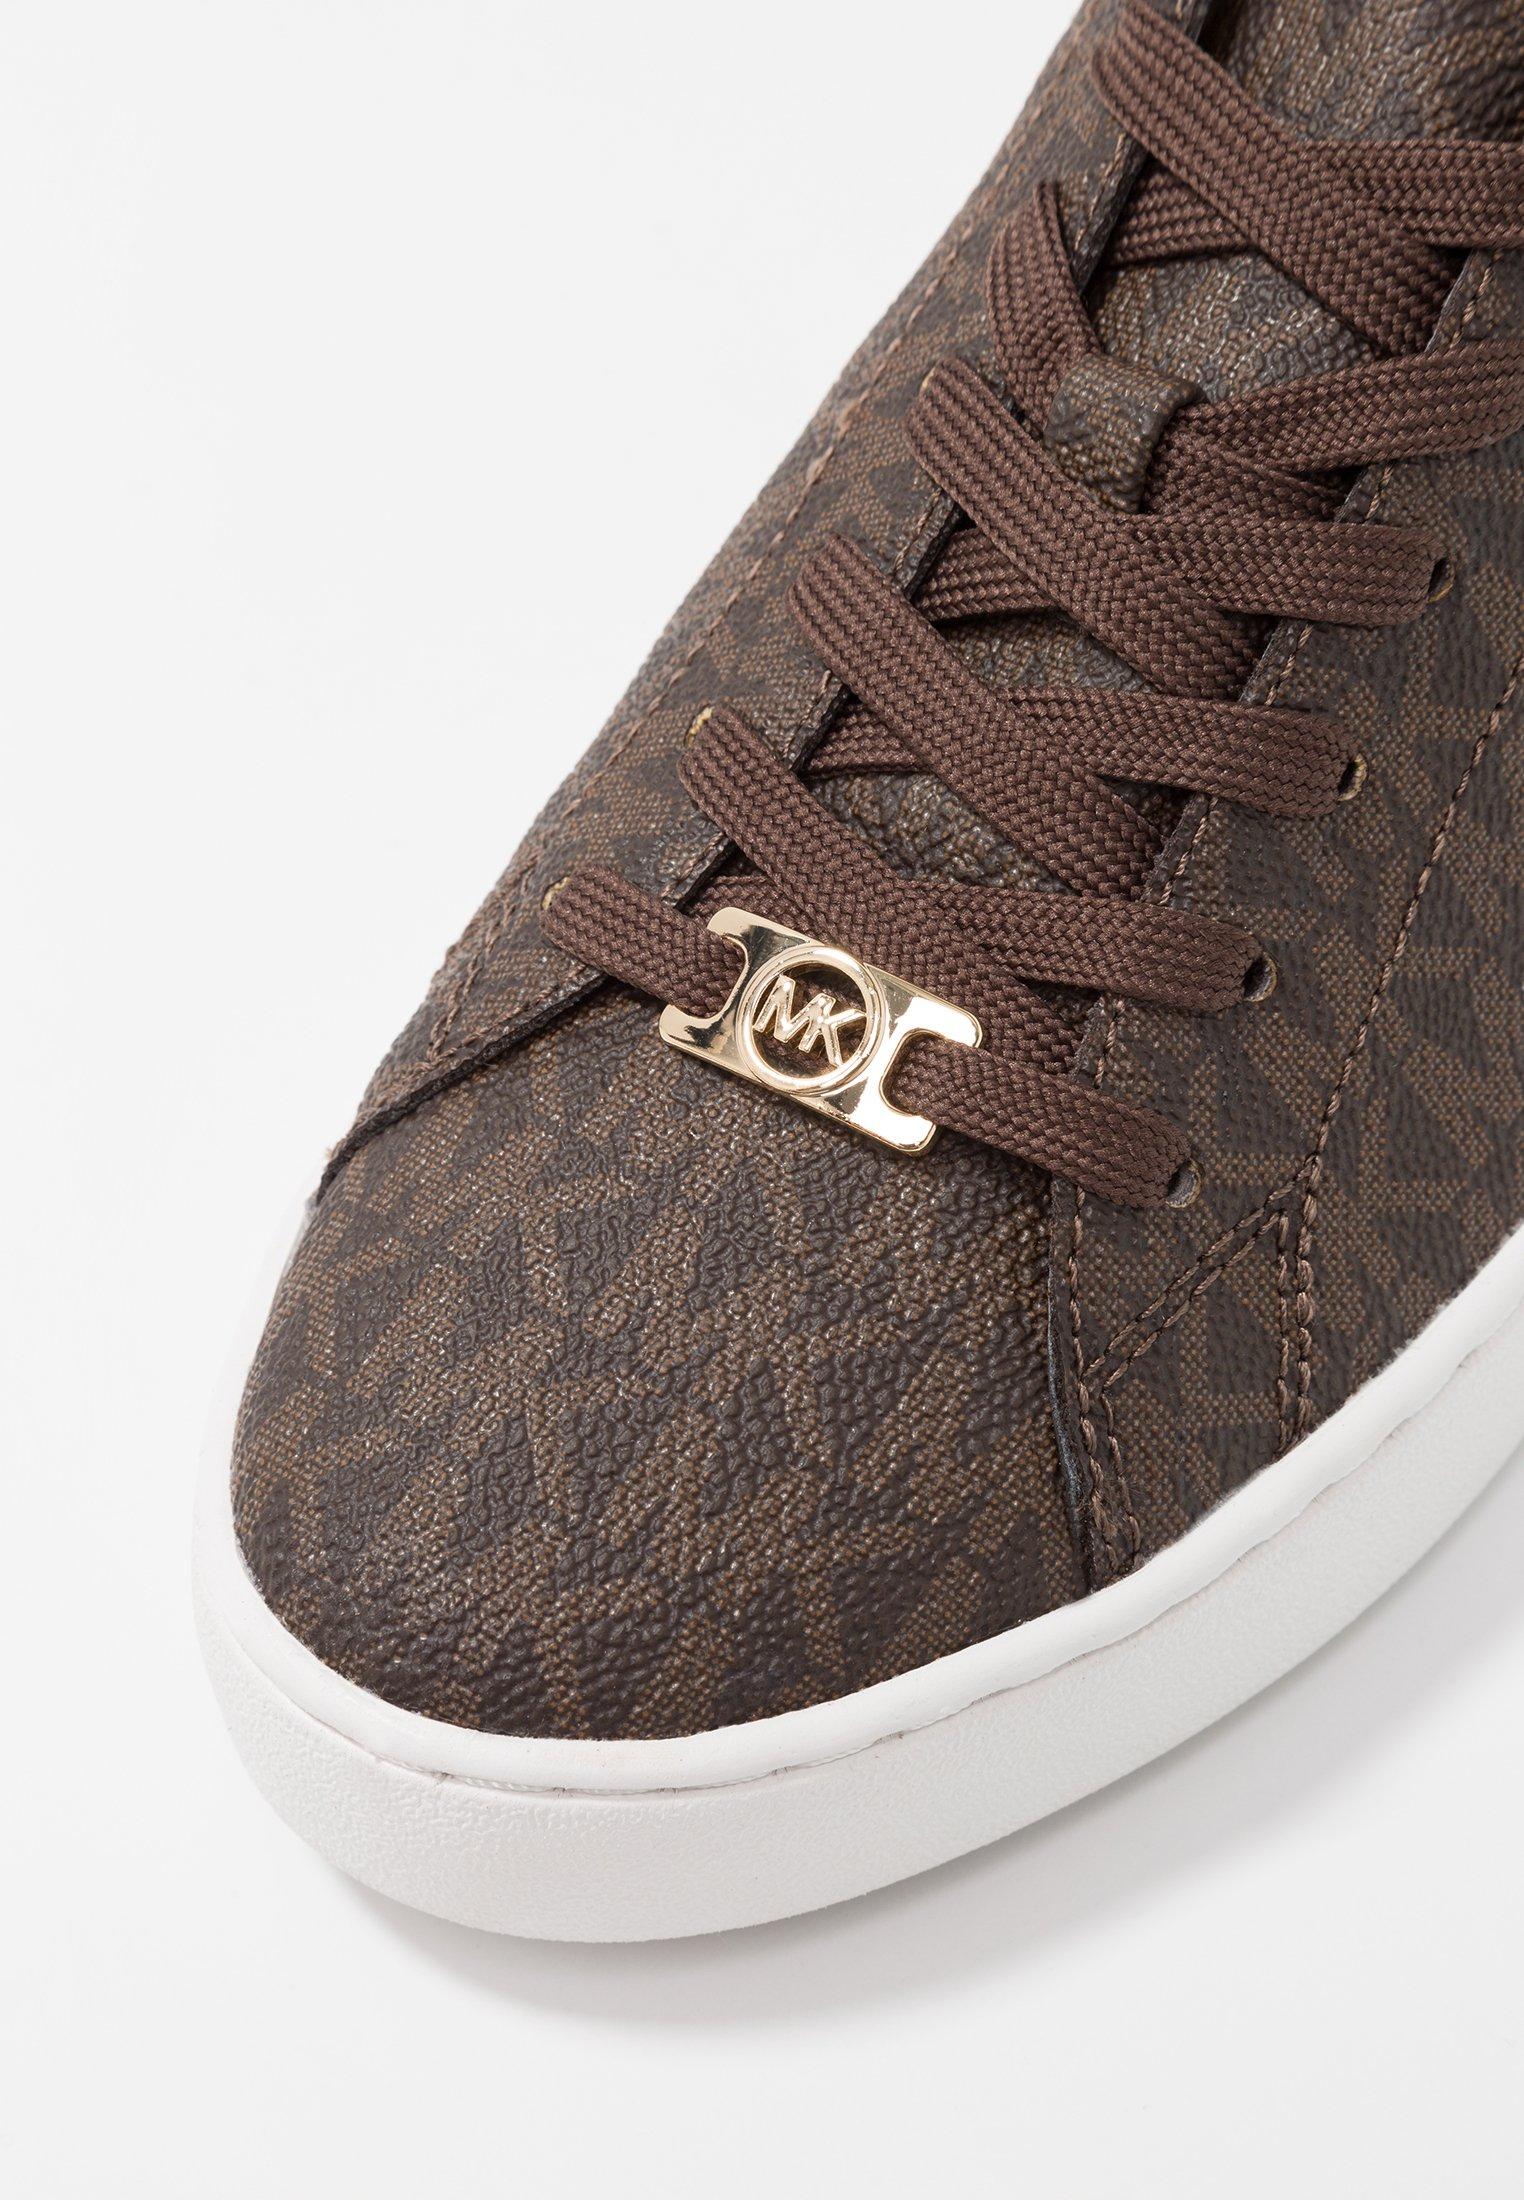 MICHAEL Michael Kors KEATON LACE UP - Sneakers basse - brown - Scarpe da donna Caldo